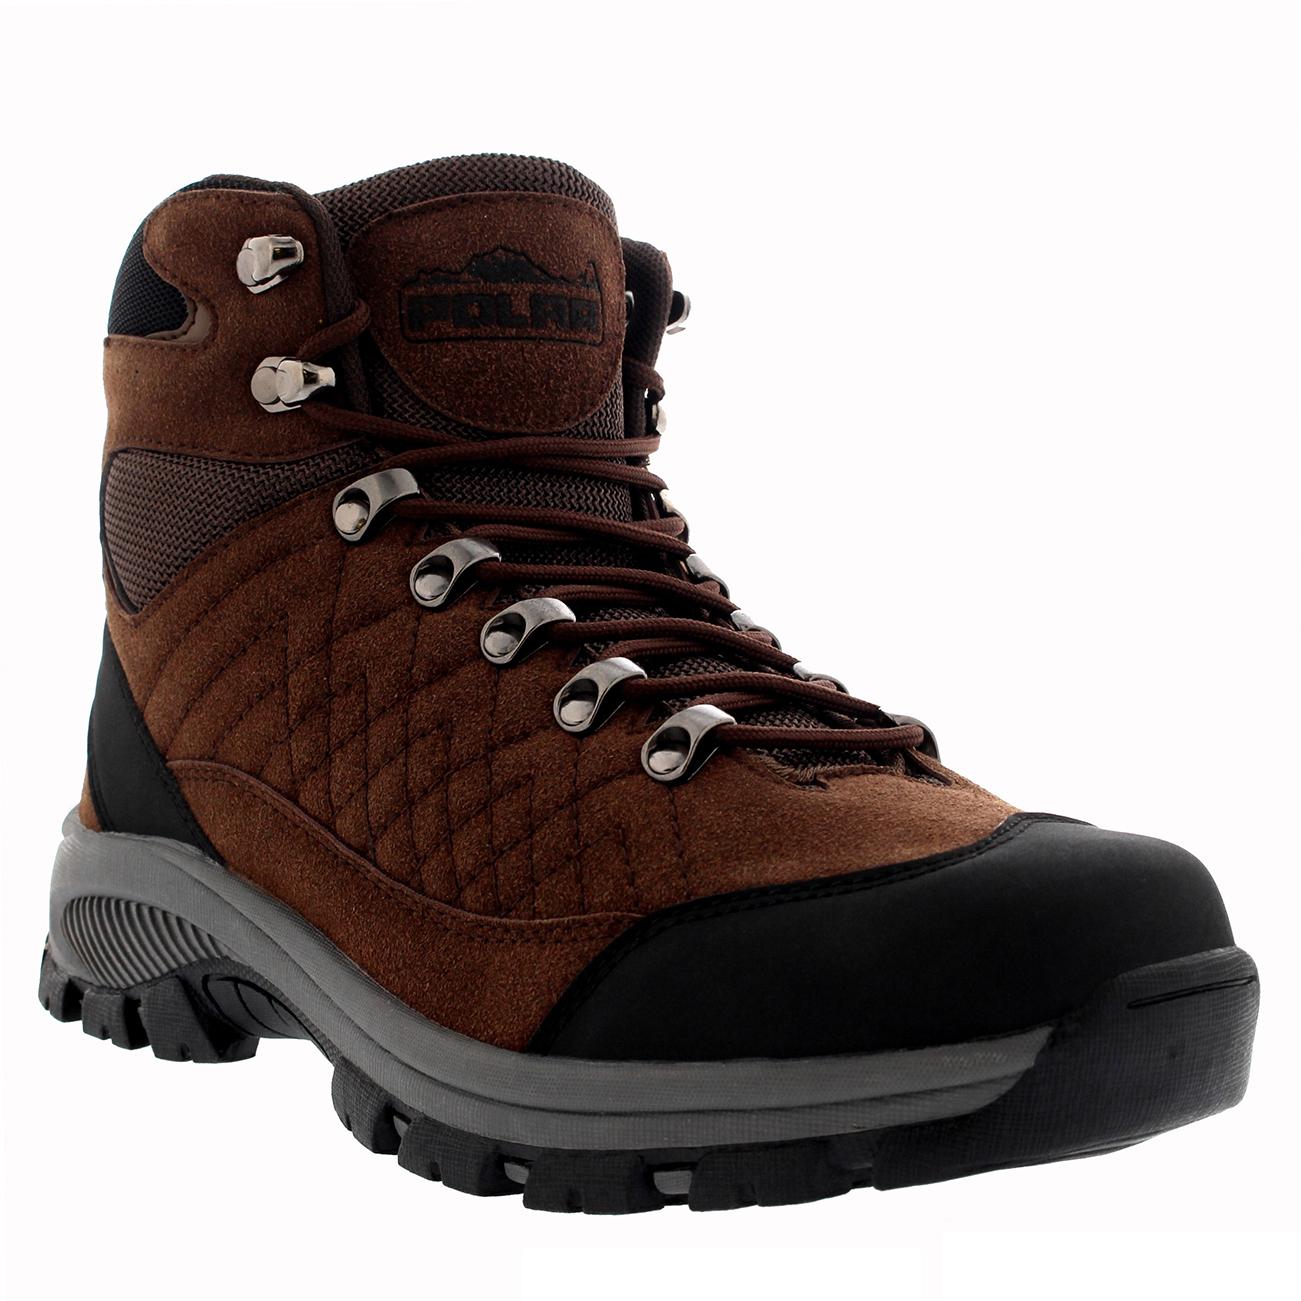 mens rambling explorer hiking walking waterproof winter outdoor boots us 7 15 ebay